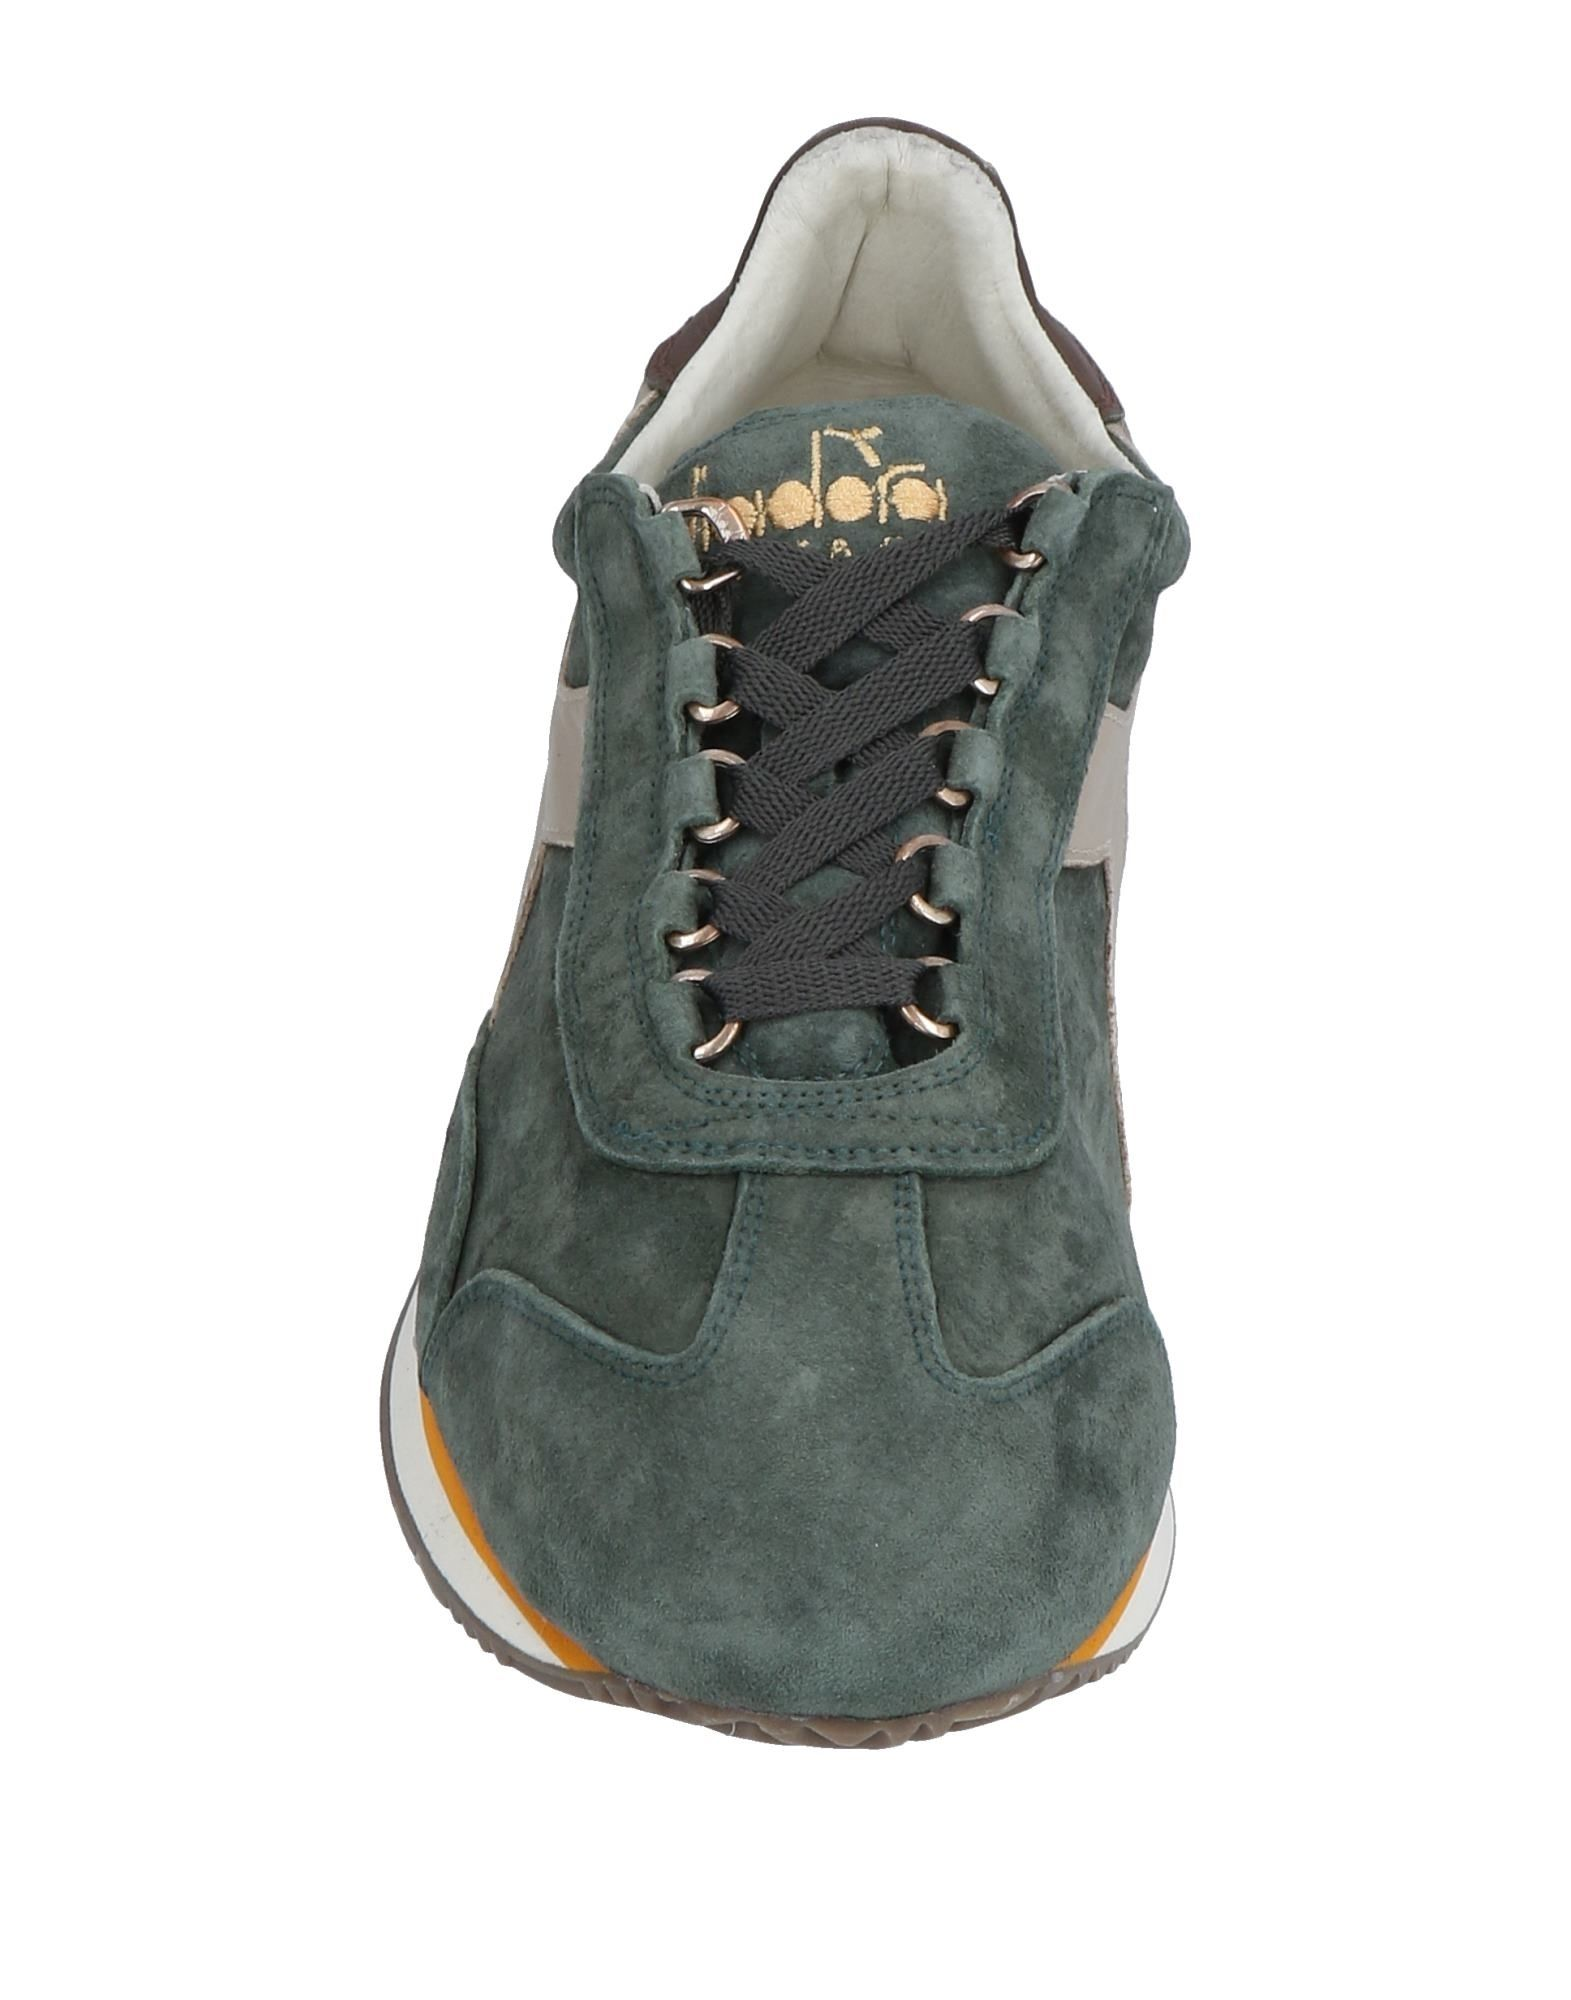 Rabatt echte Schuhe Diadora Heritage Sneakers Herren  11497283HC 11497283HC 11497283HC 73cdfb